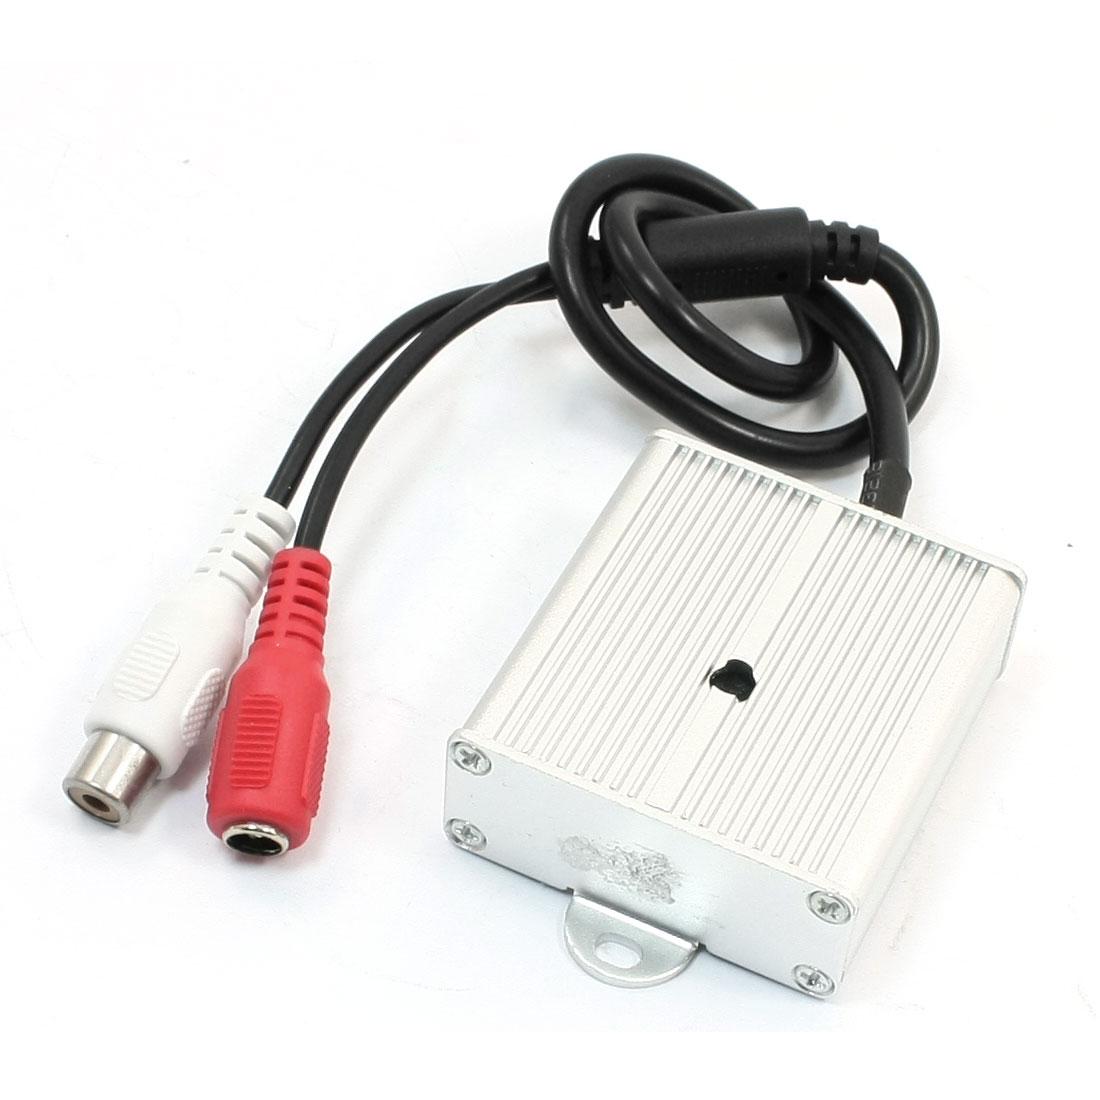 DC 6V-12V 10mA Audio Micro Subtle Sound Monitor Monitoring Pick-up